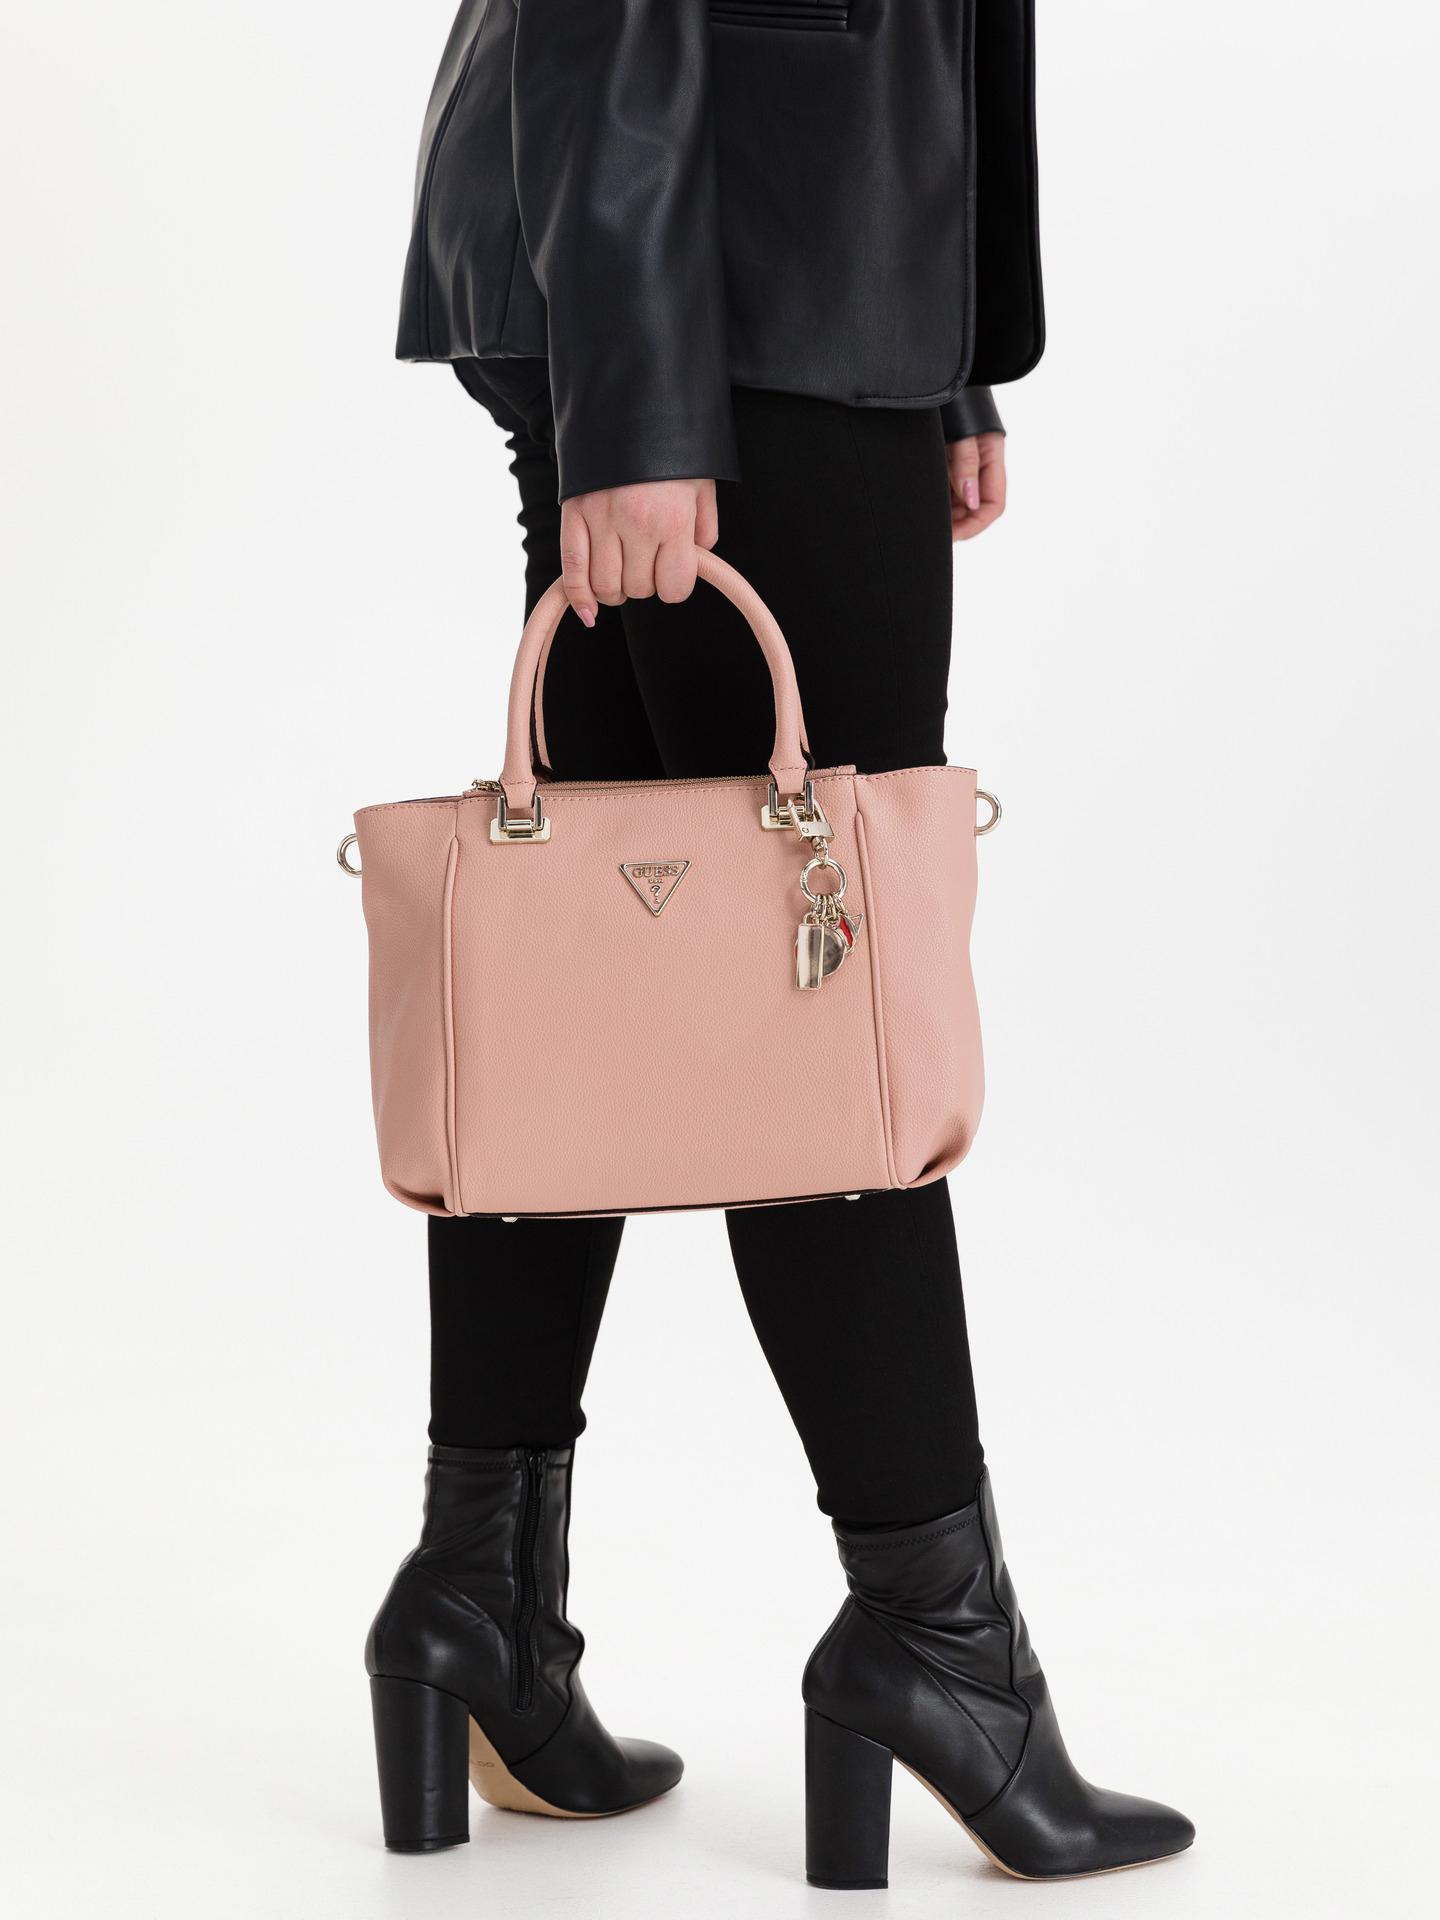 Guess pink handbag Destiny Status